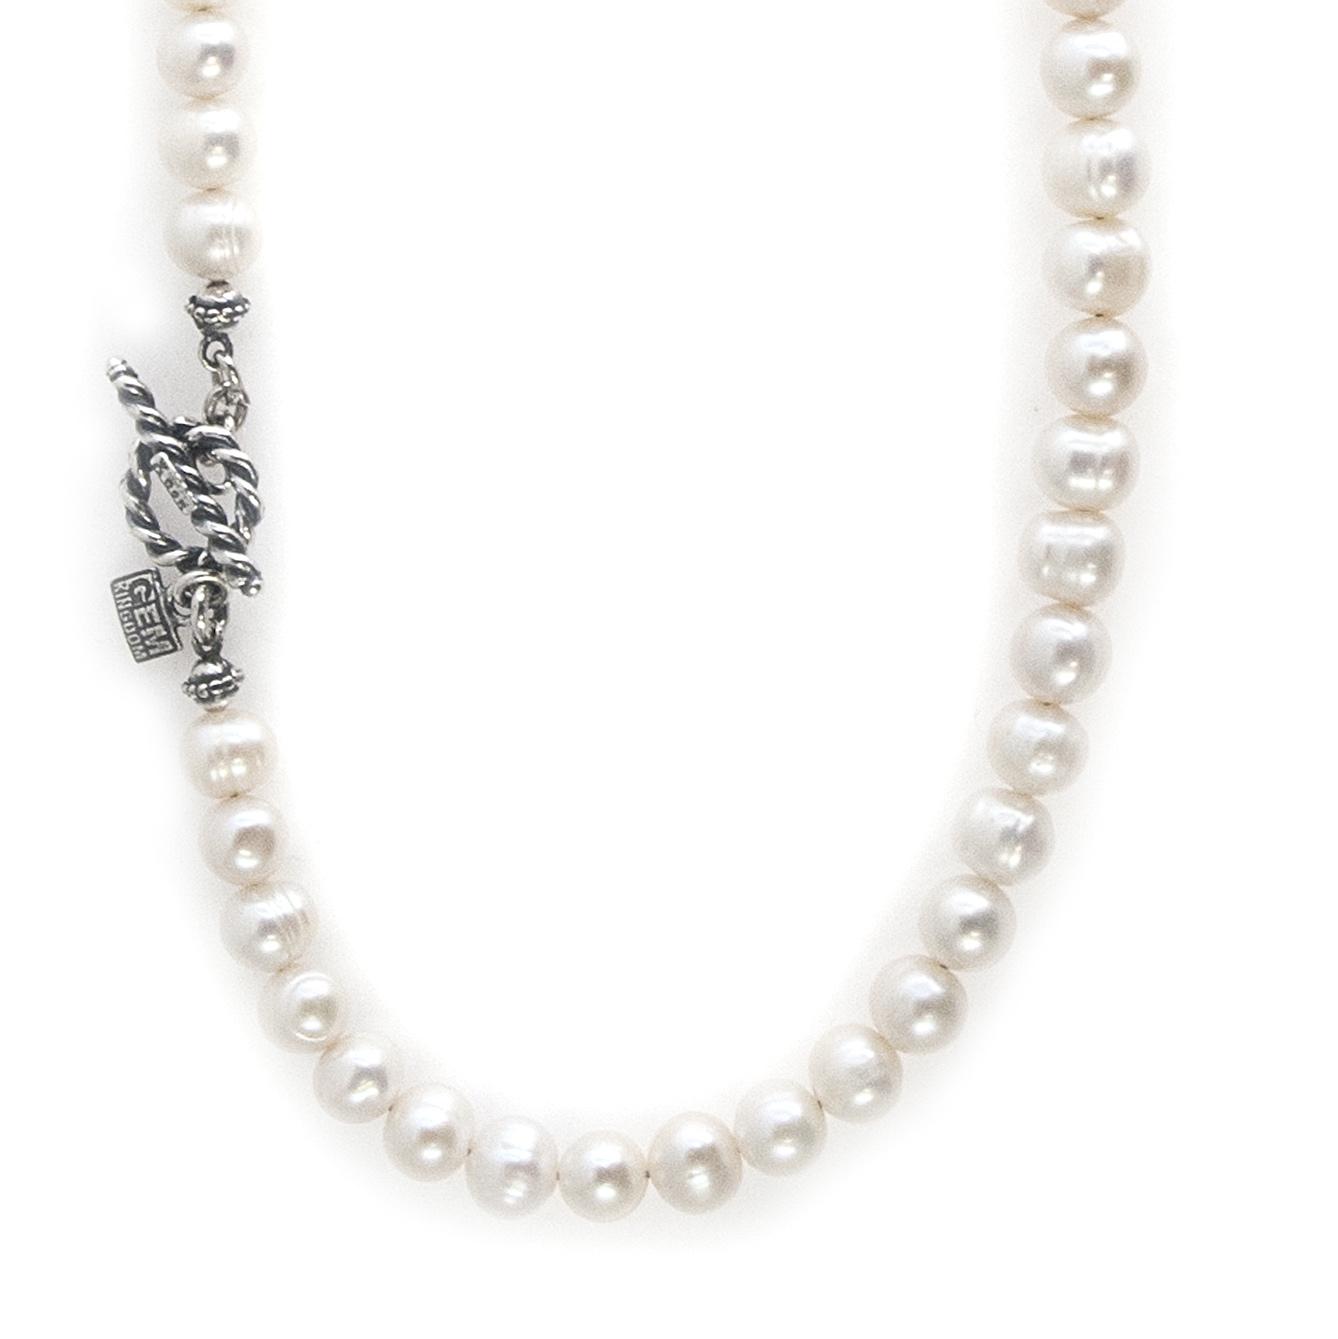 Gem Kingdom Chain White Pearls 01